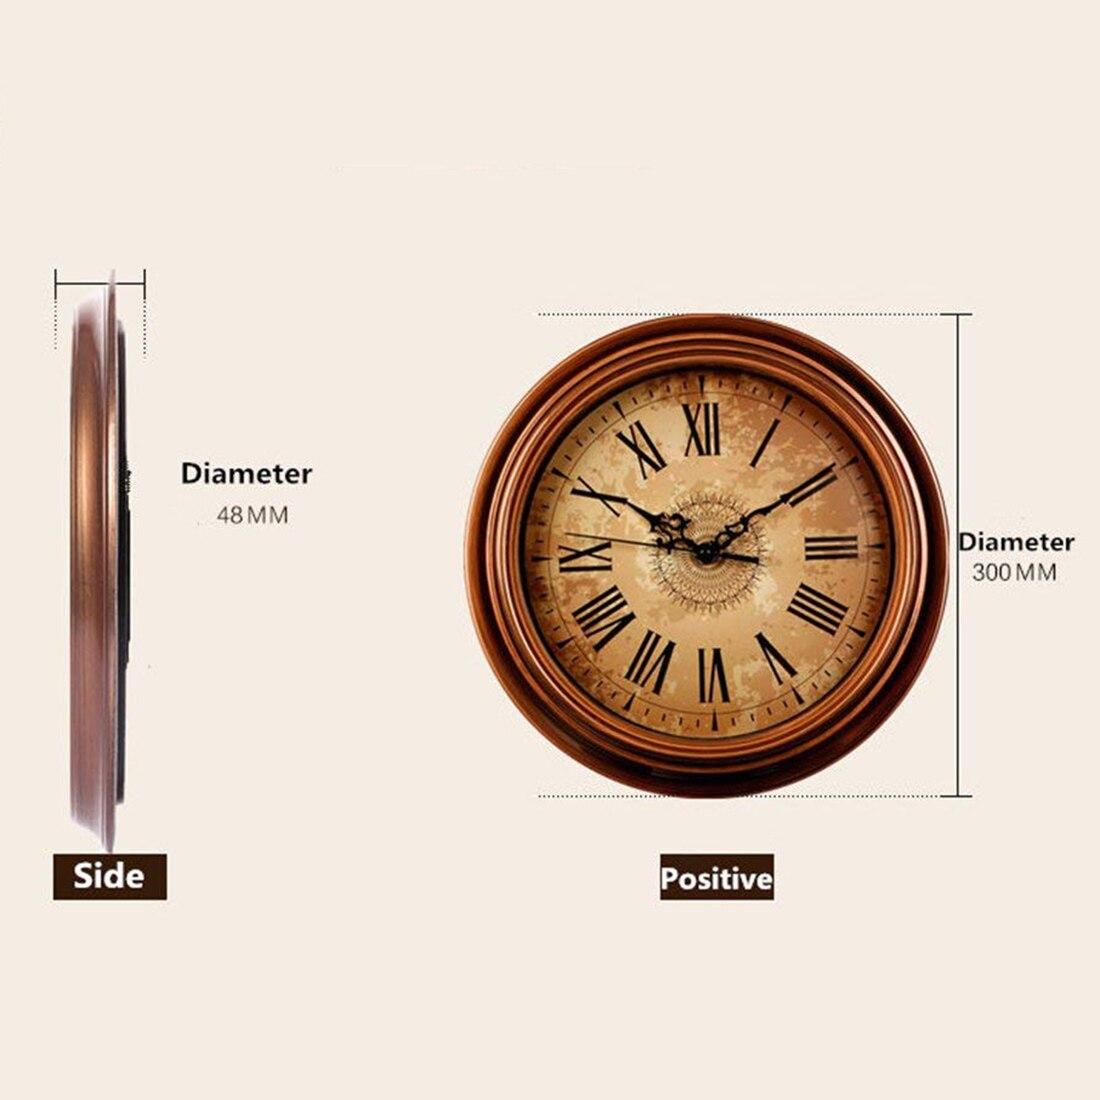 12 Inch Silent Non Ticking Round Wall Clocks Decorative